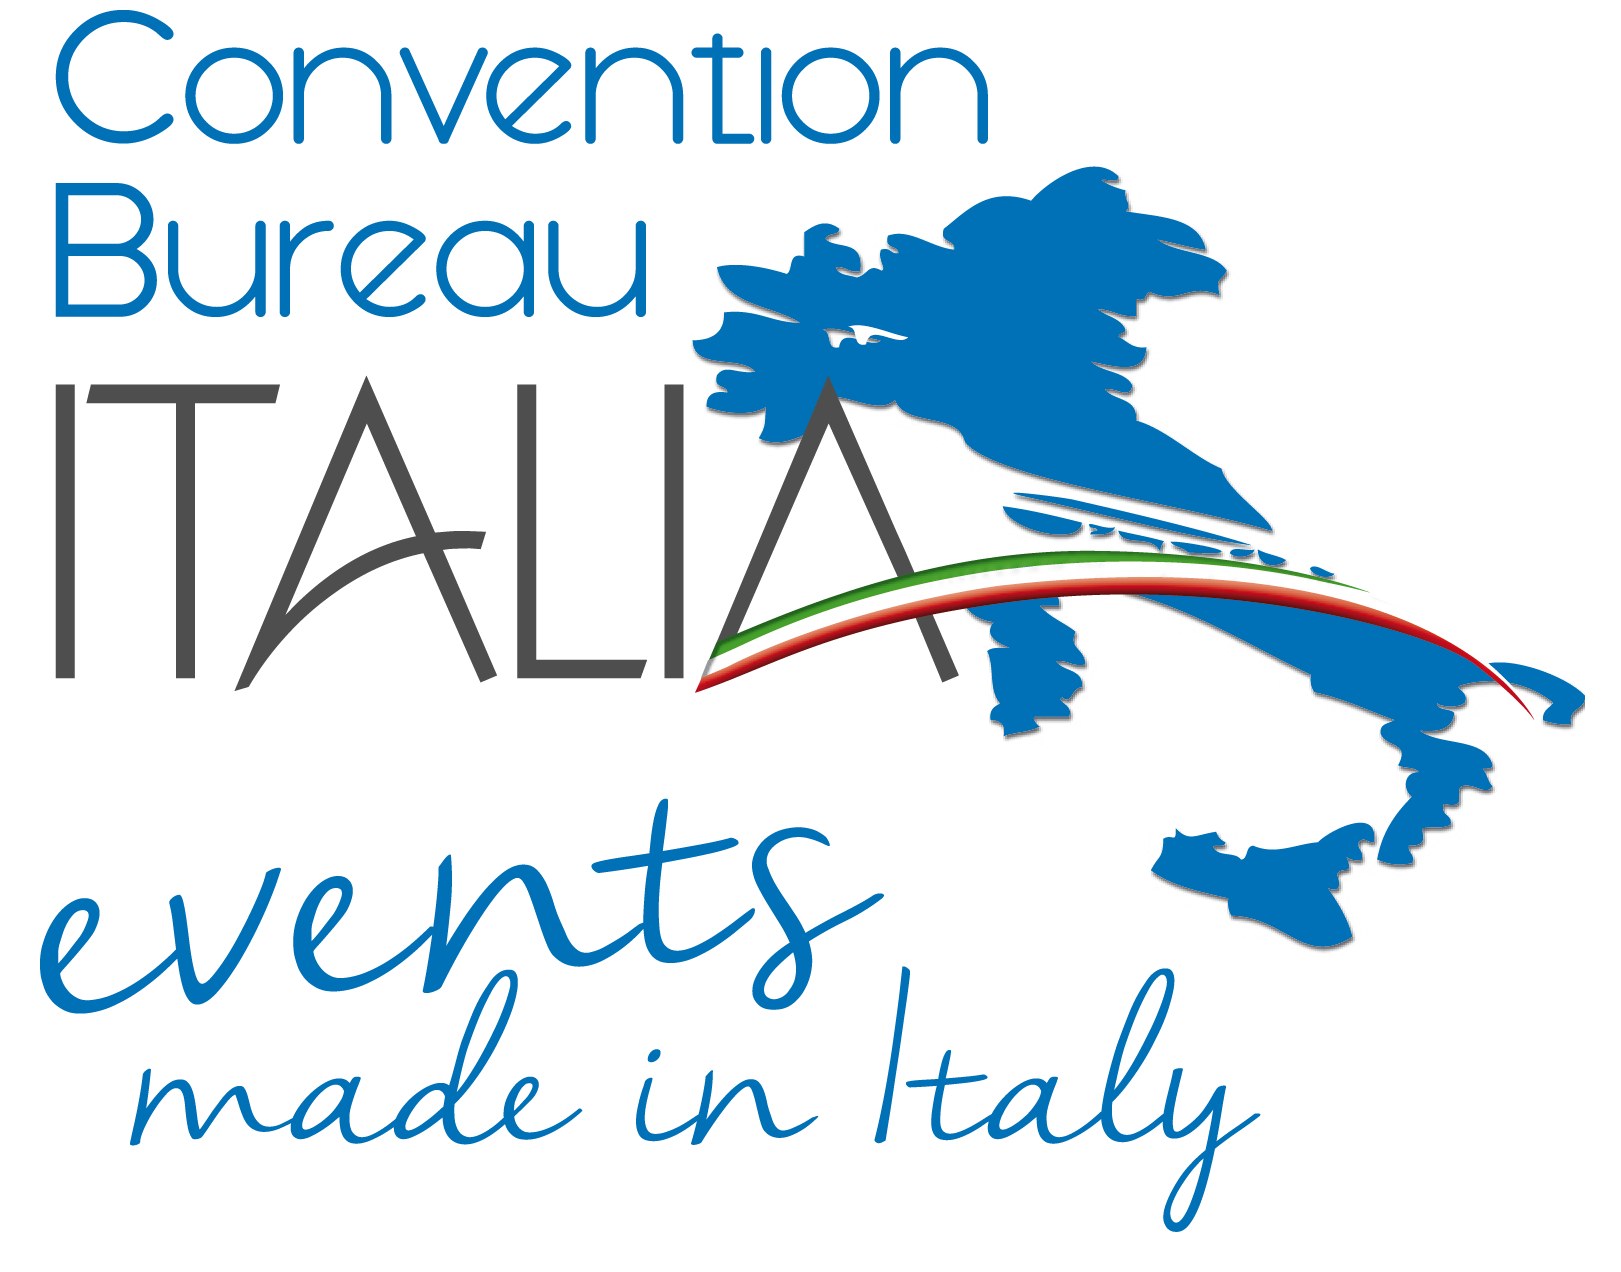 il convention bureau italia taglia il traguardo dei cento soci webitmag web in travel magazine. Black Bedroom Furniture Sets. Home Design Ideas